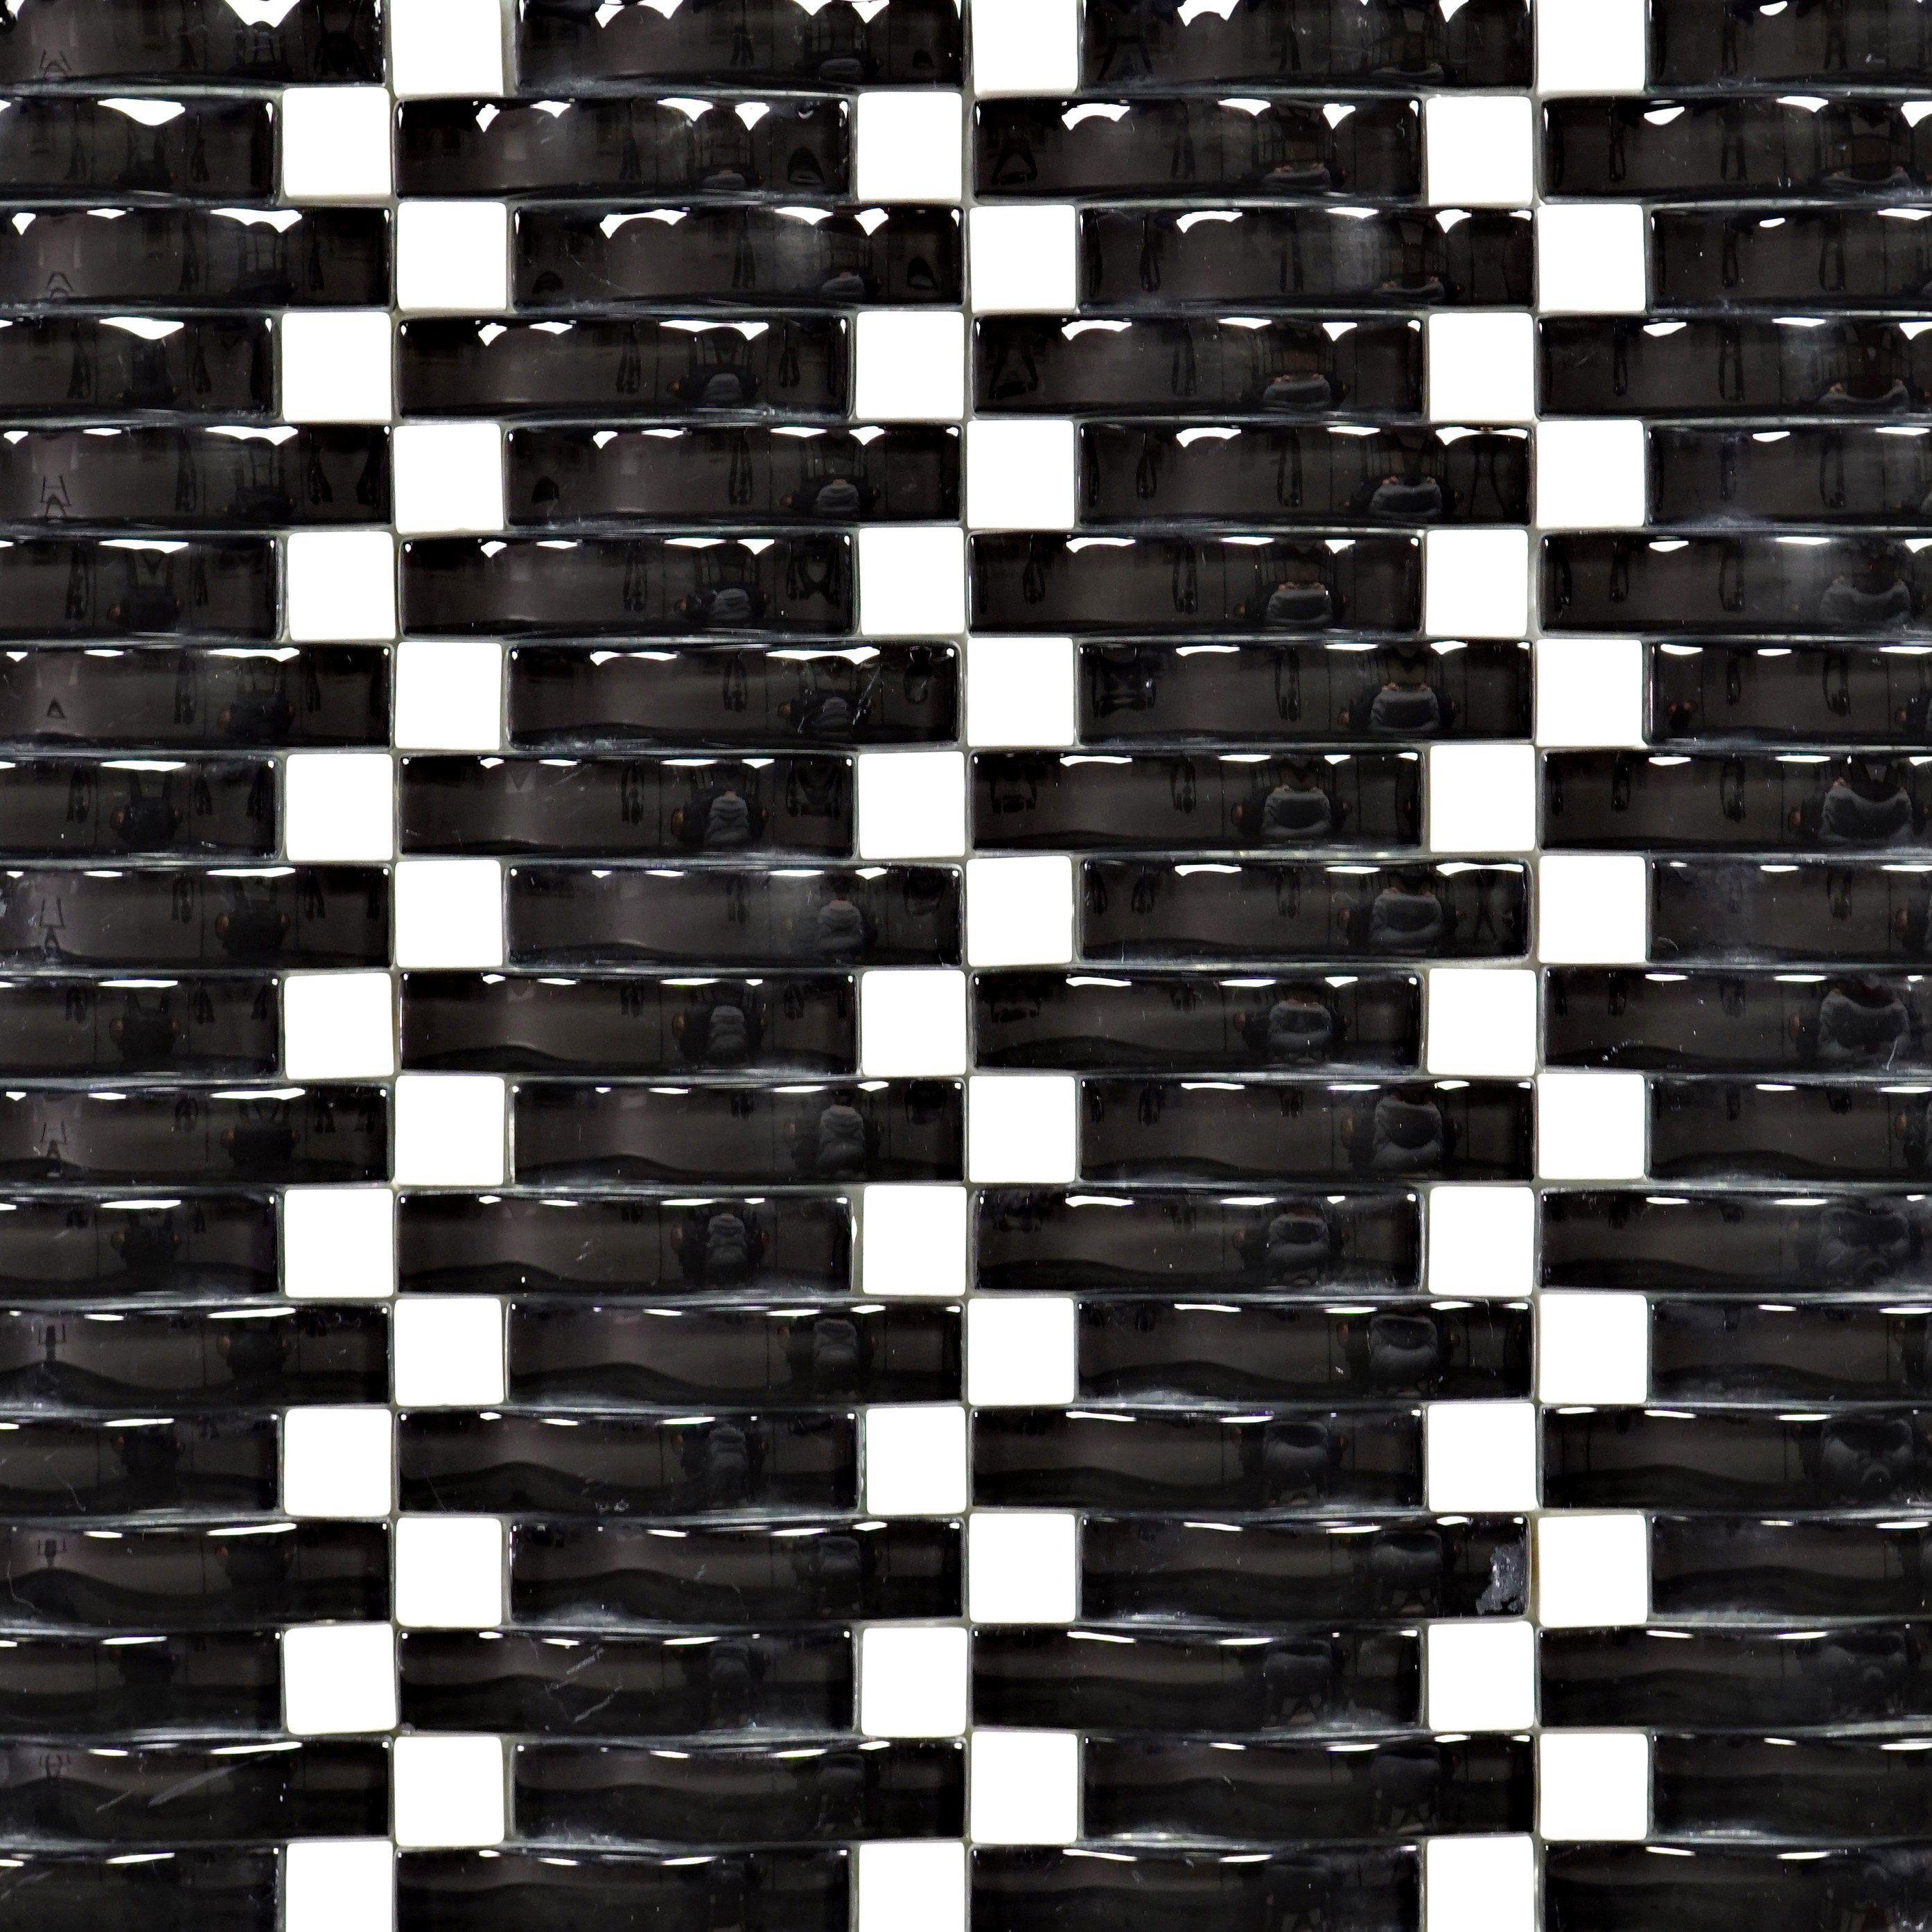 Tcg 09 3d Wave Black And White Glass Mosaic Tile Sheet Kitchen And Bath Backsplash Wall Tile Mosaic Glass Glass Mosaic Tiles Mosaic Tile Sheets